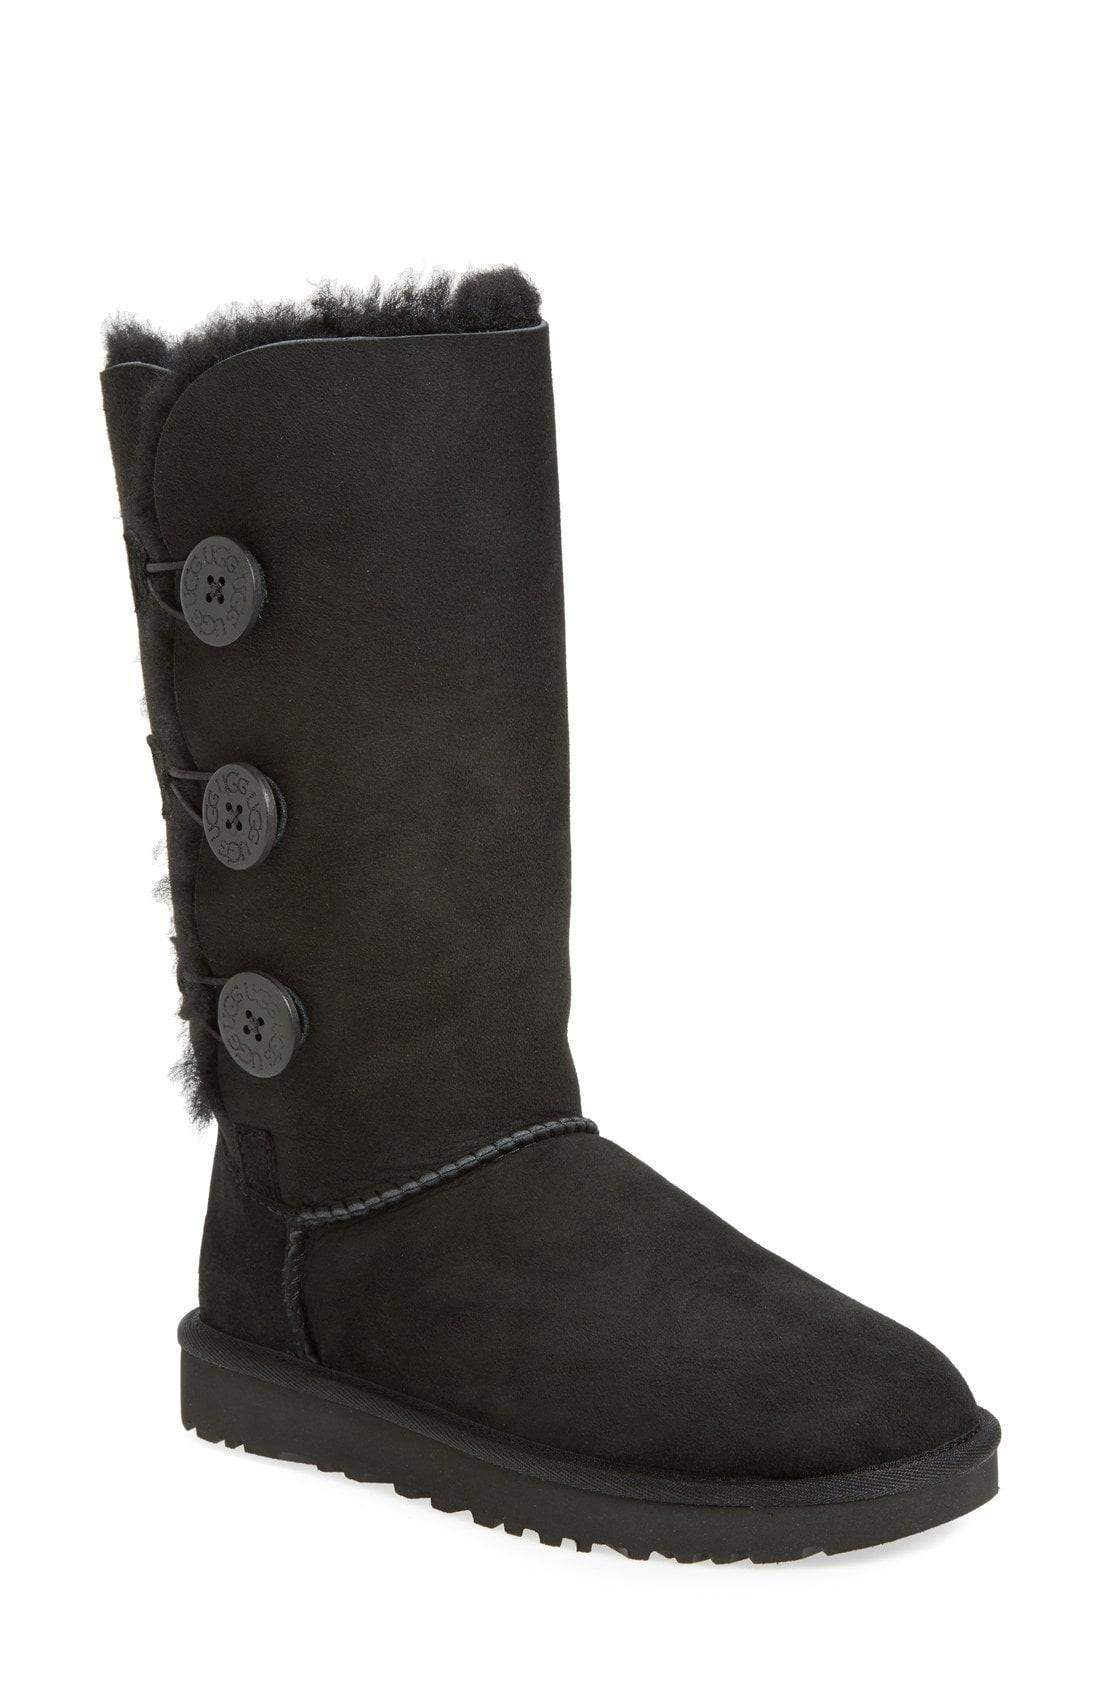 0550247aa65 Women's Bailey Button Triplet Sheepskin Mid Calf Boots in Black Suede